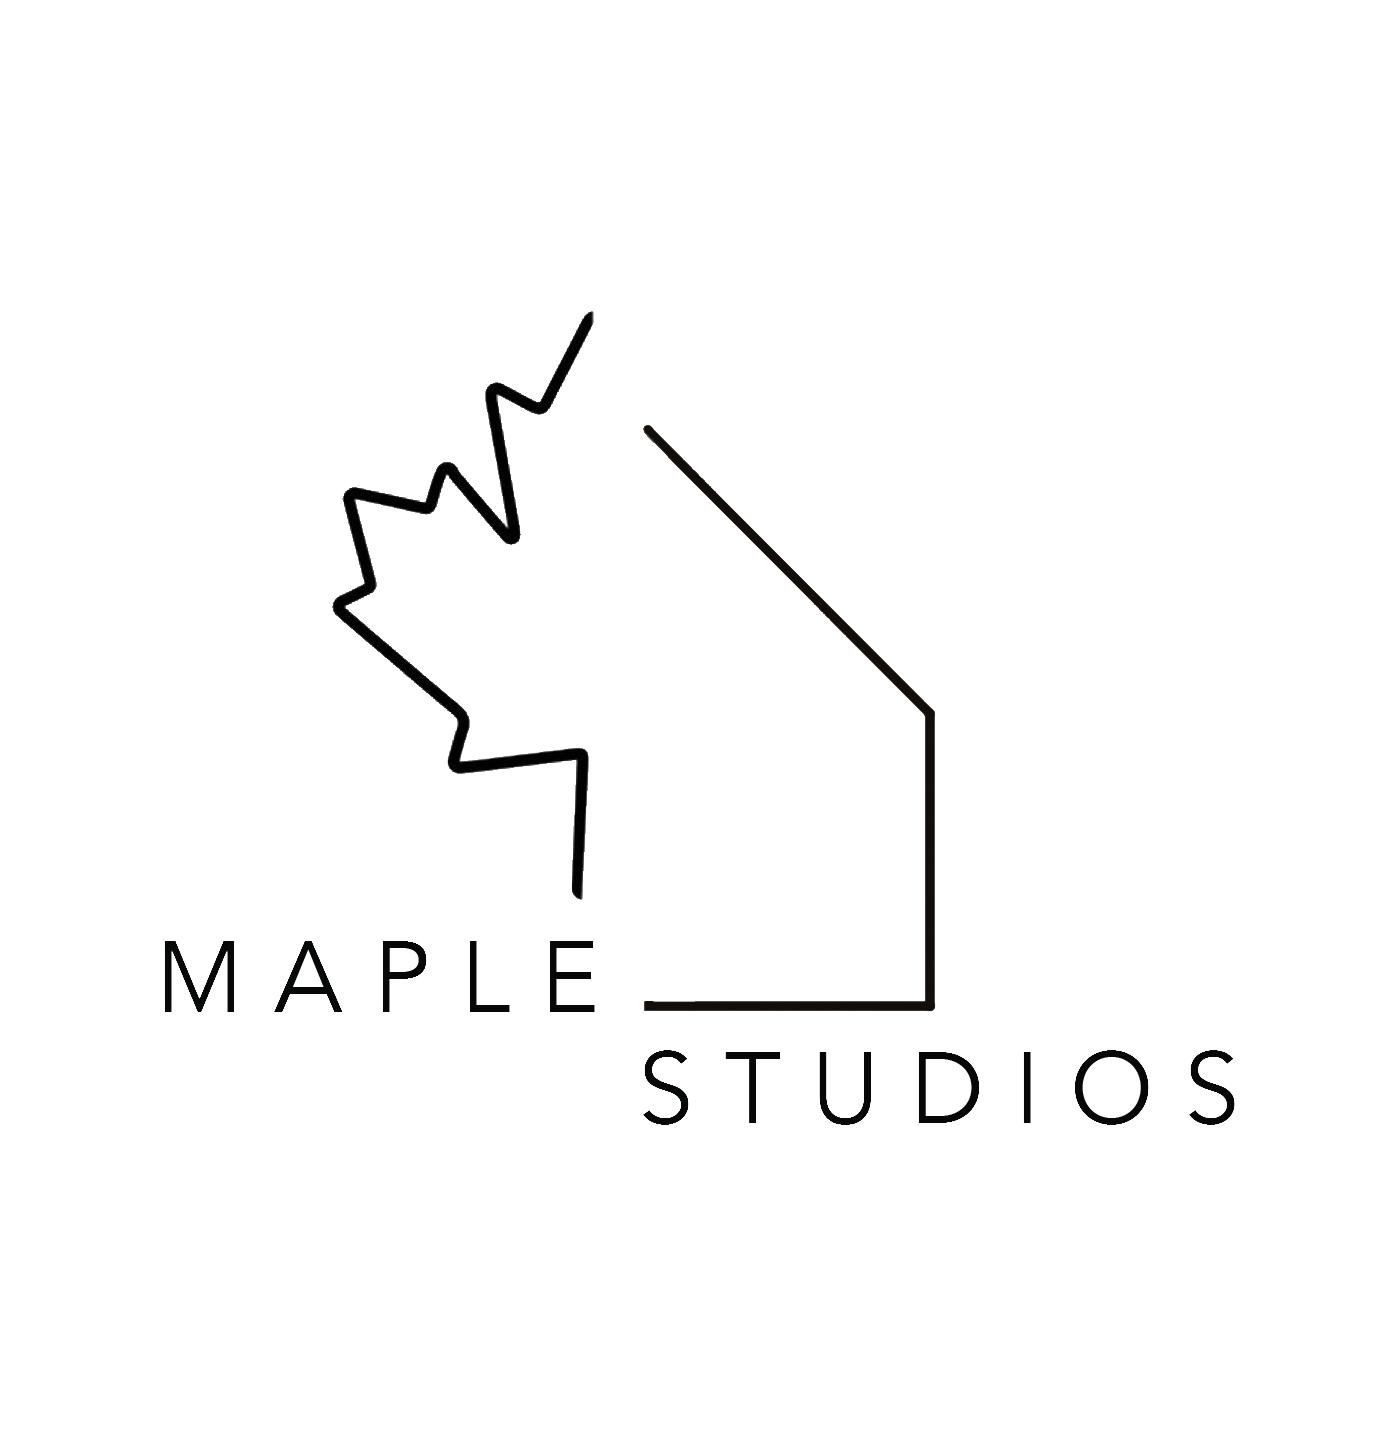 maple_studios_02.jpg